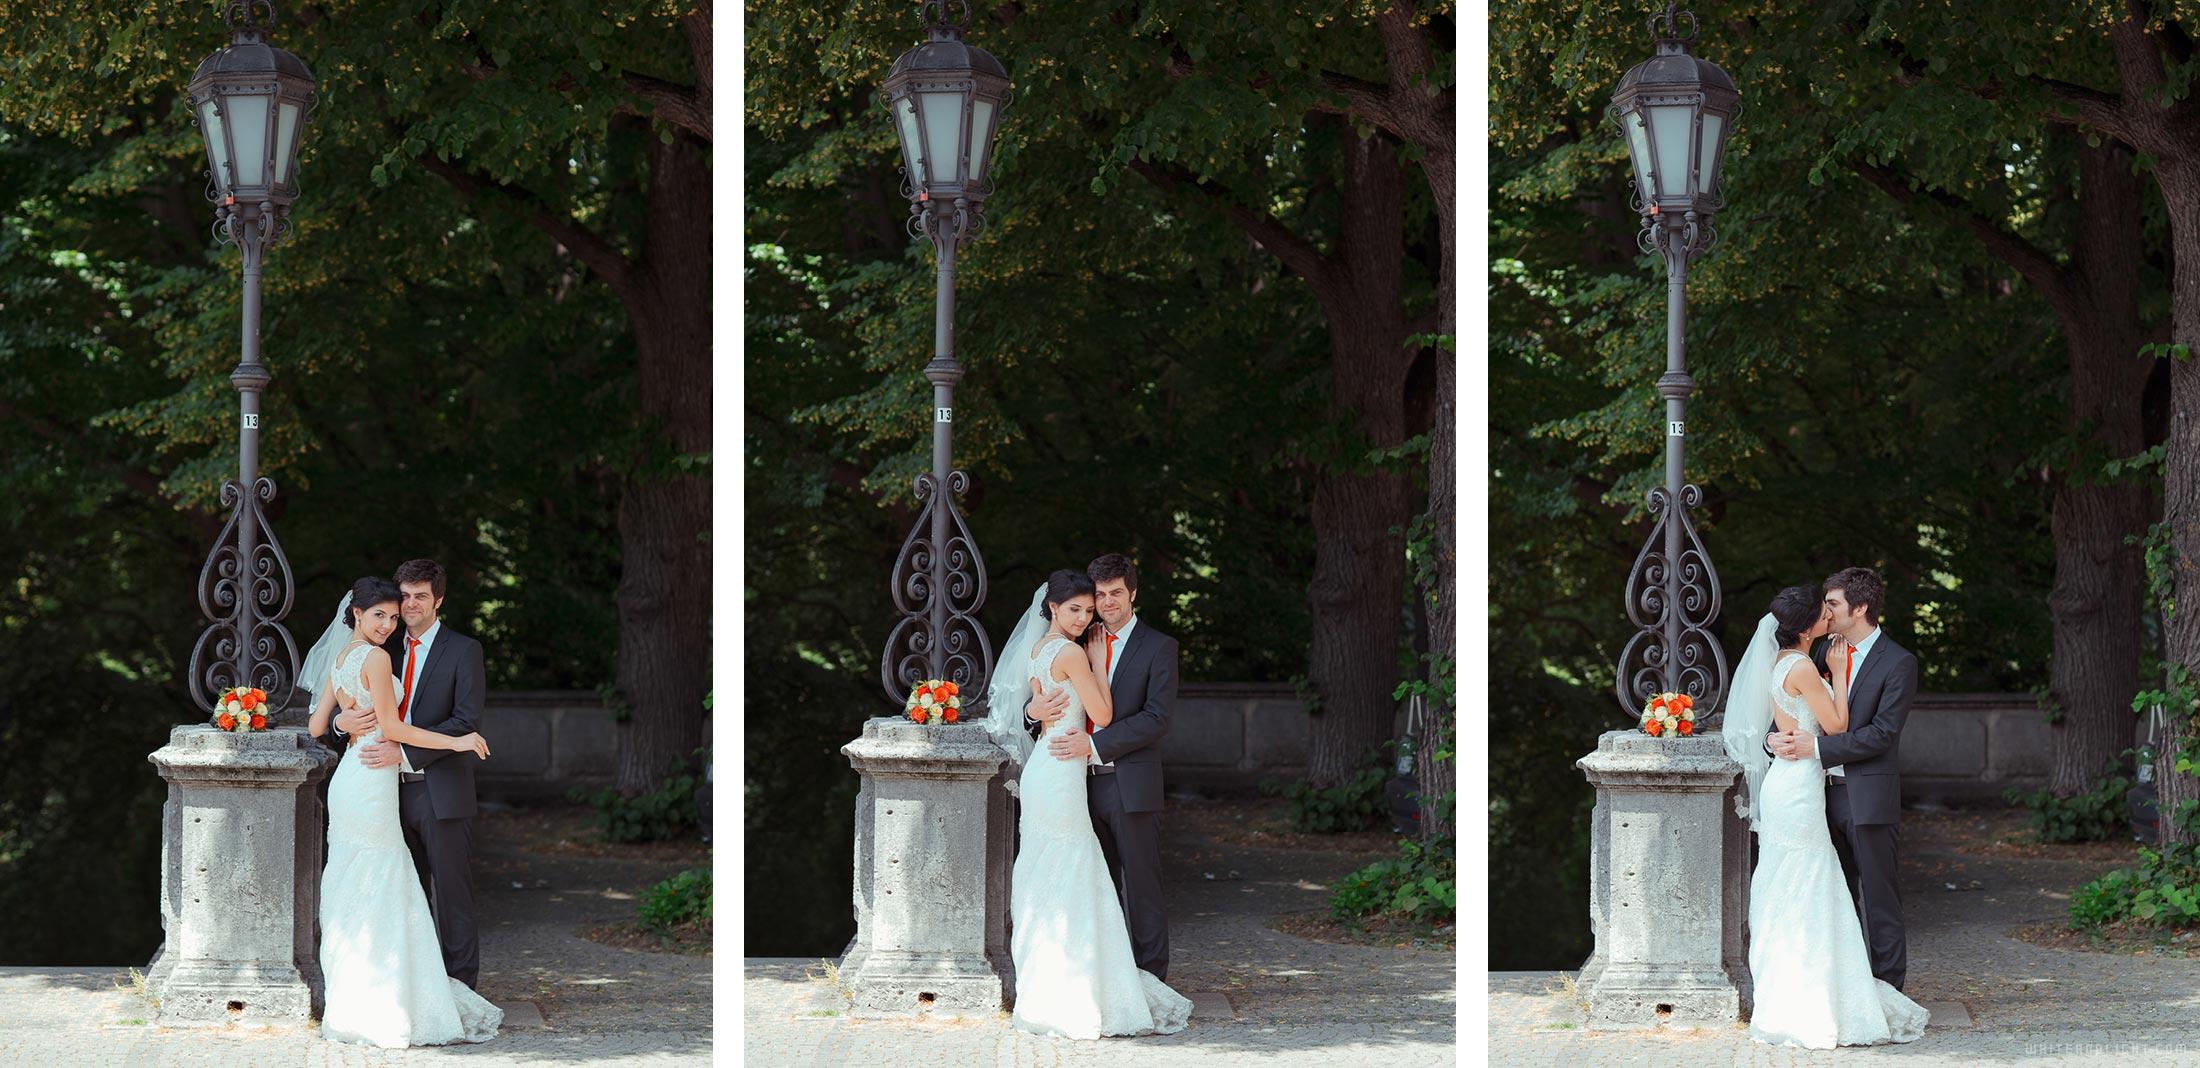 wedding photographer estimate